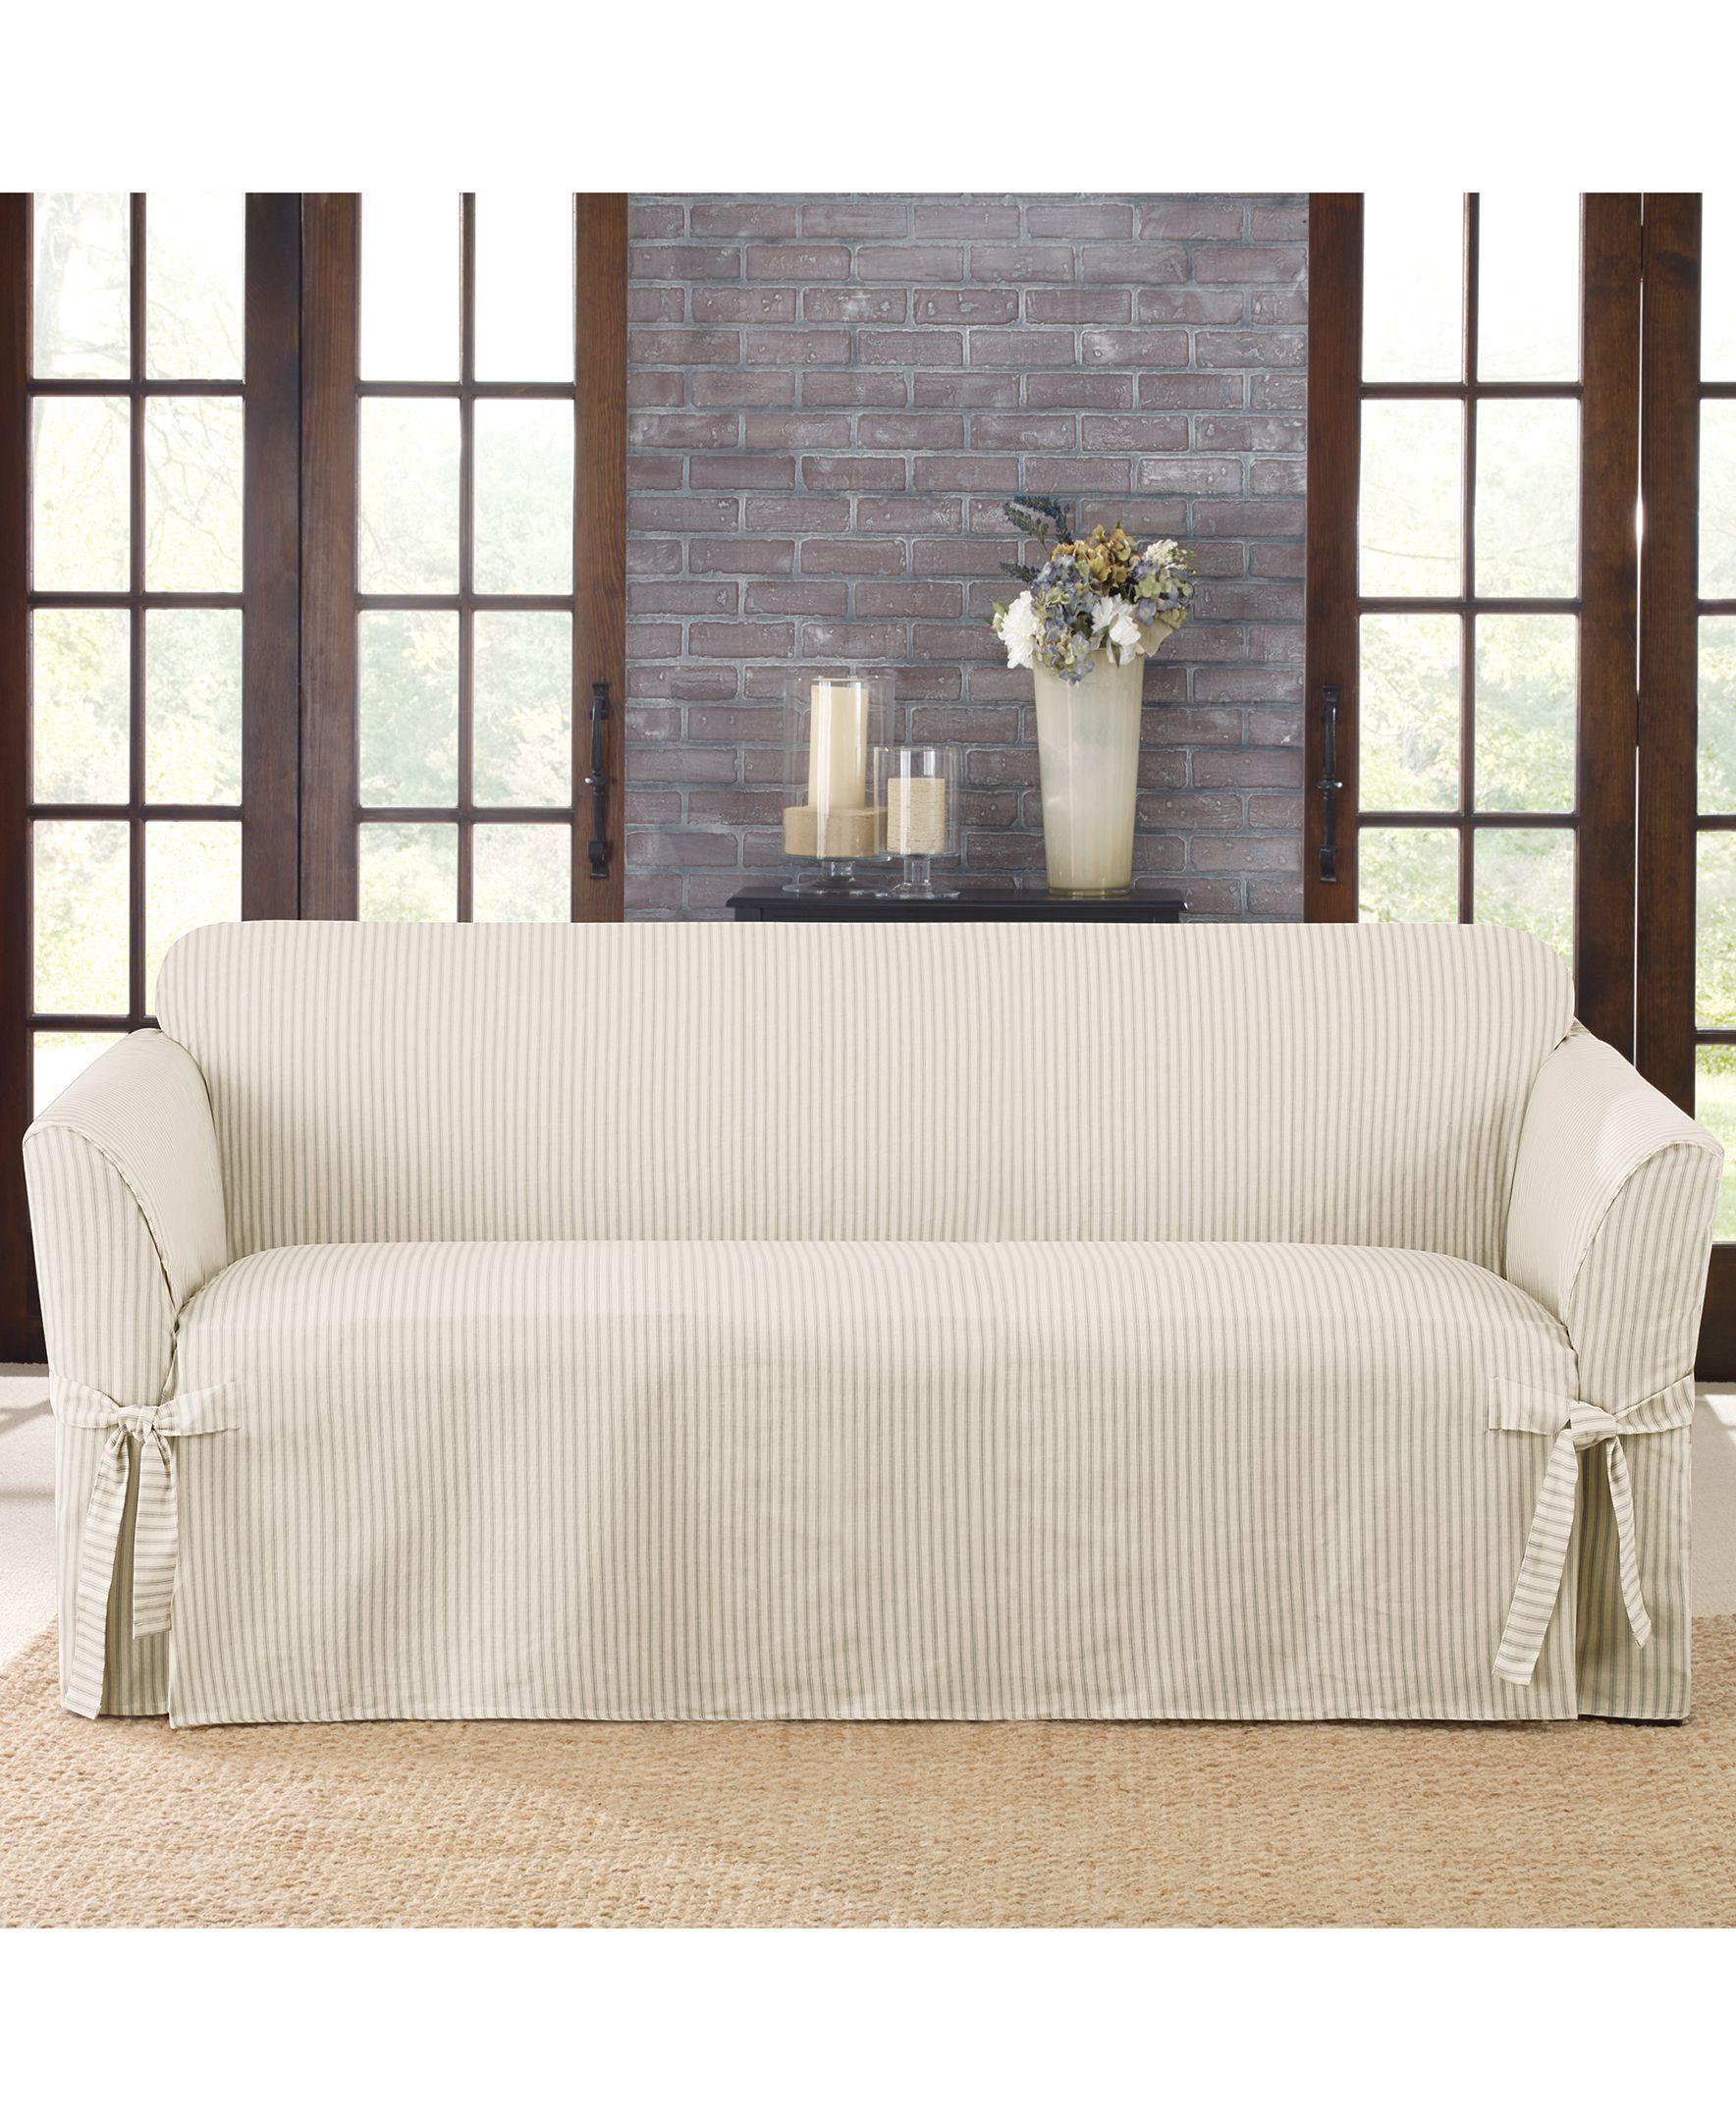 Sure Fit Ticking Stripe Sofa Slipcover Cushions On Sofa Slipcovered Sofa Slipcovers For Chairs